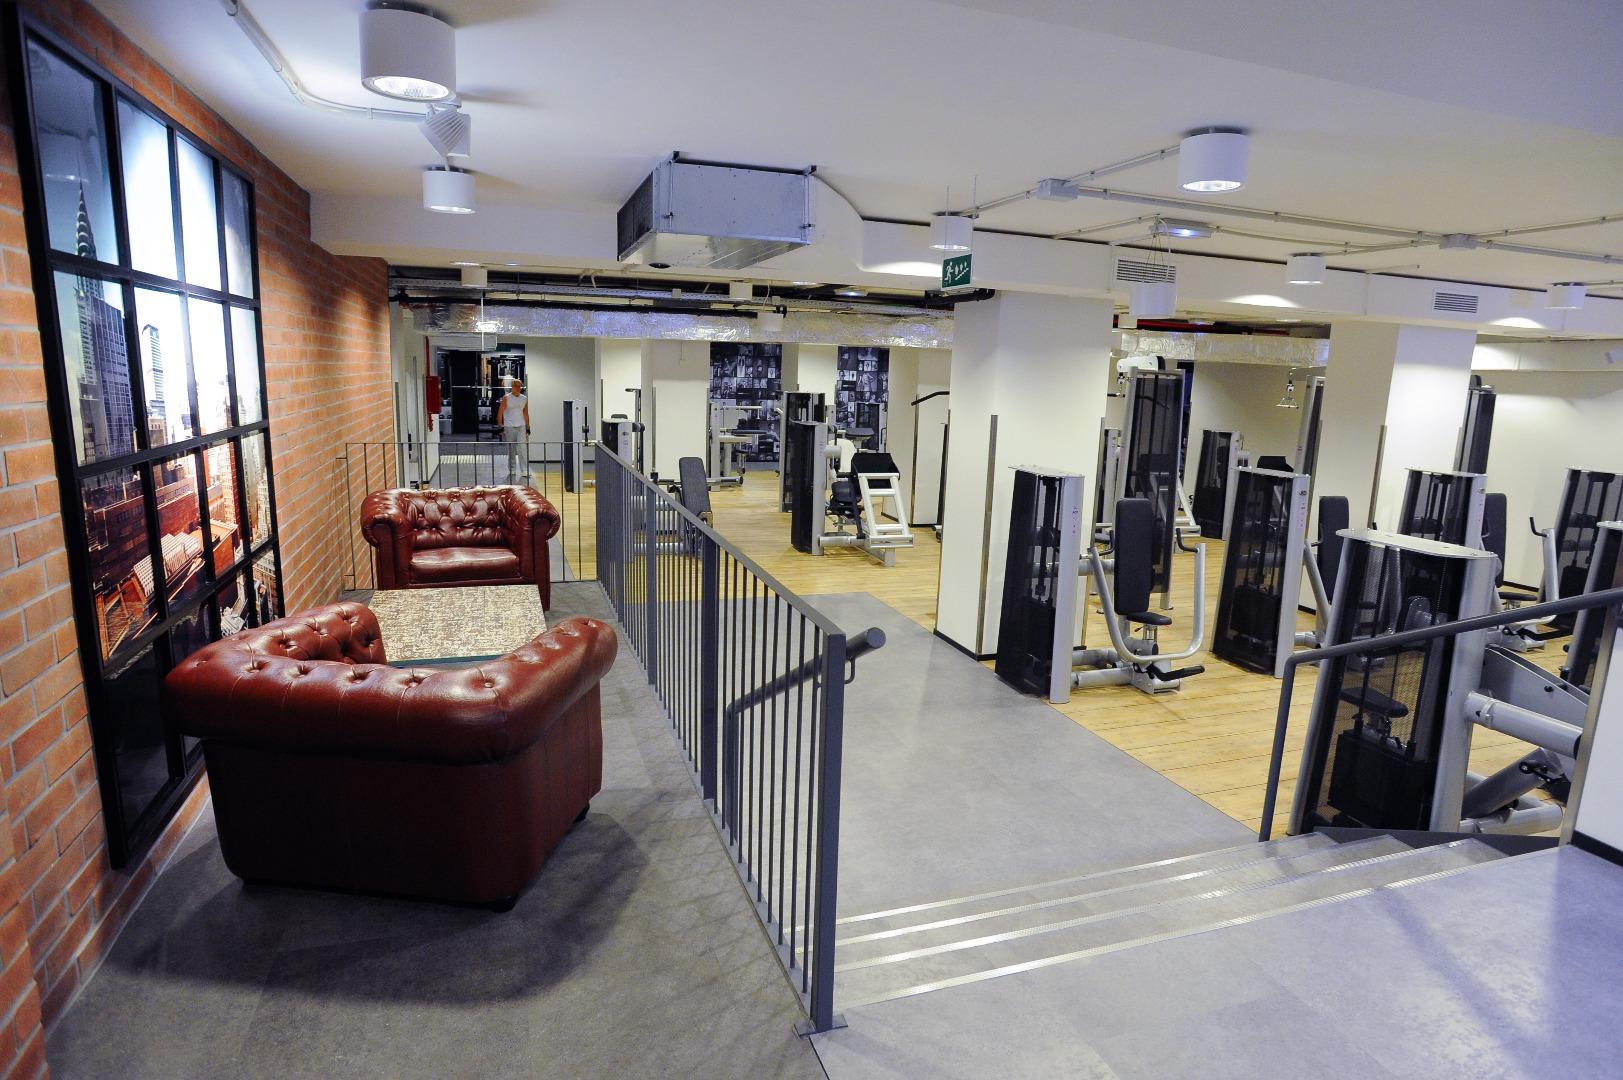 Picture 7 Deals for Gym McFIT Hospitalet - C.C La Farga L'Hospitalet de Llobregat